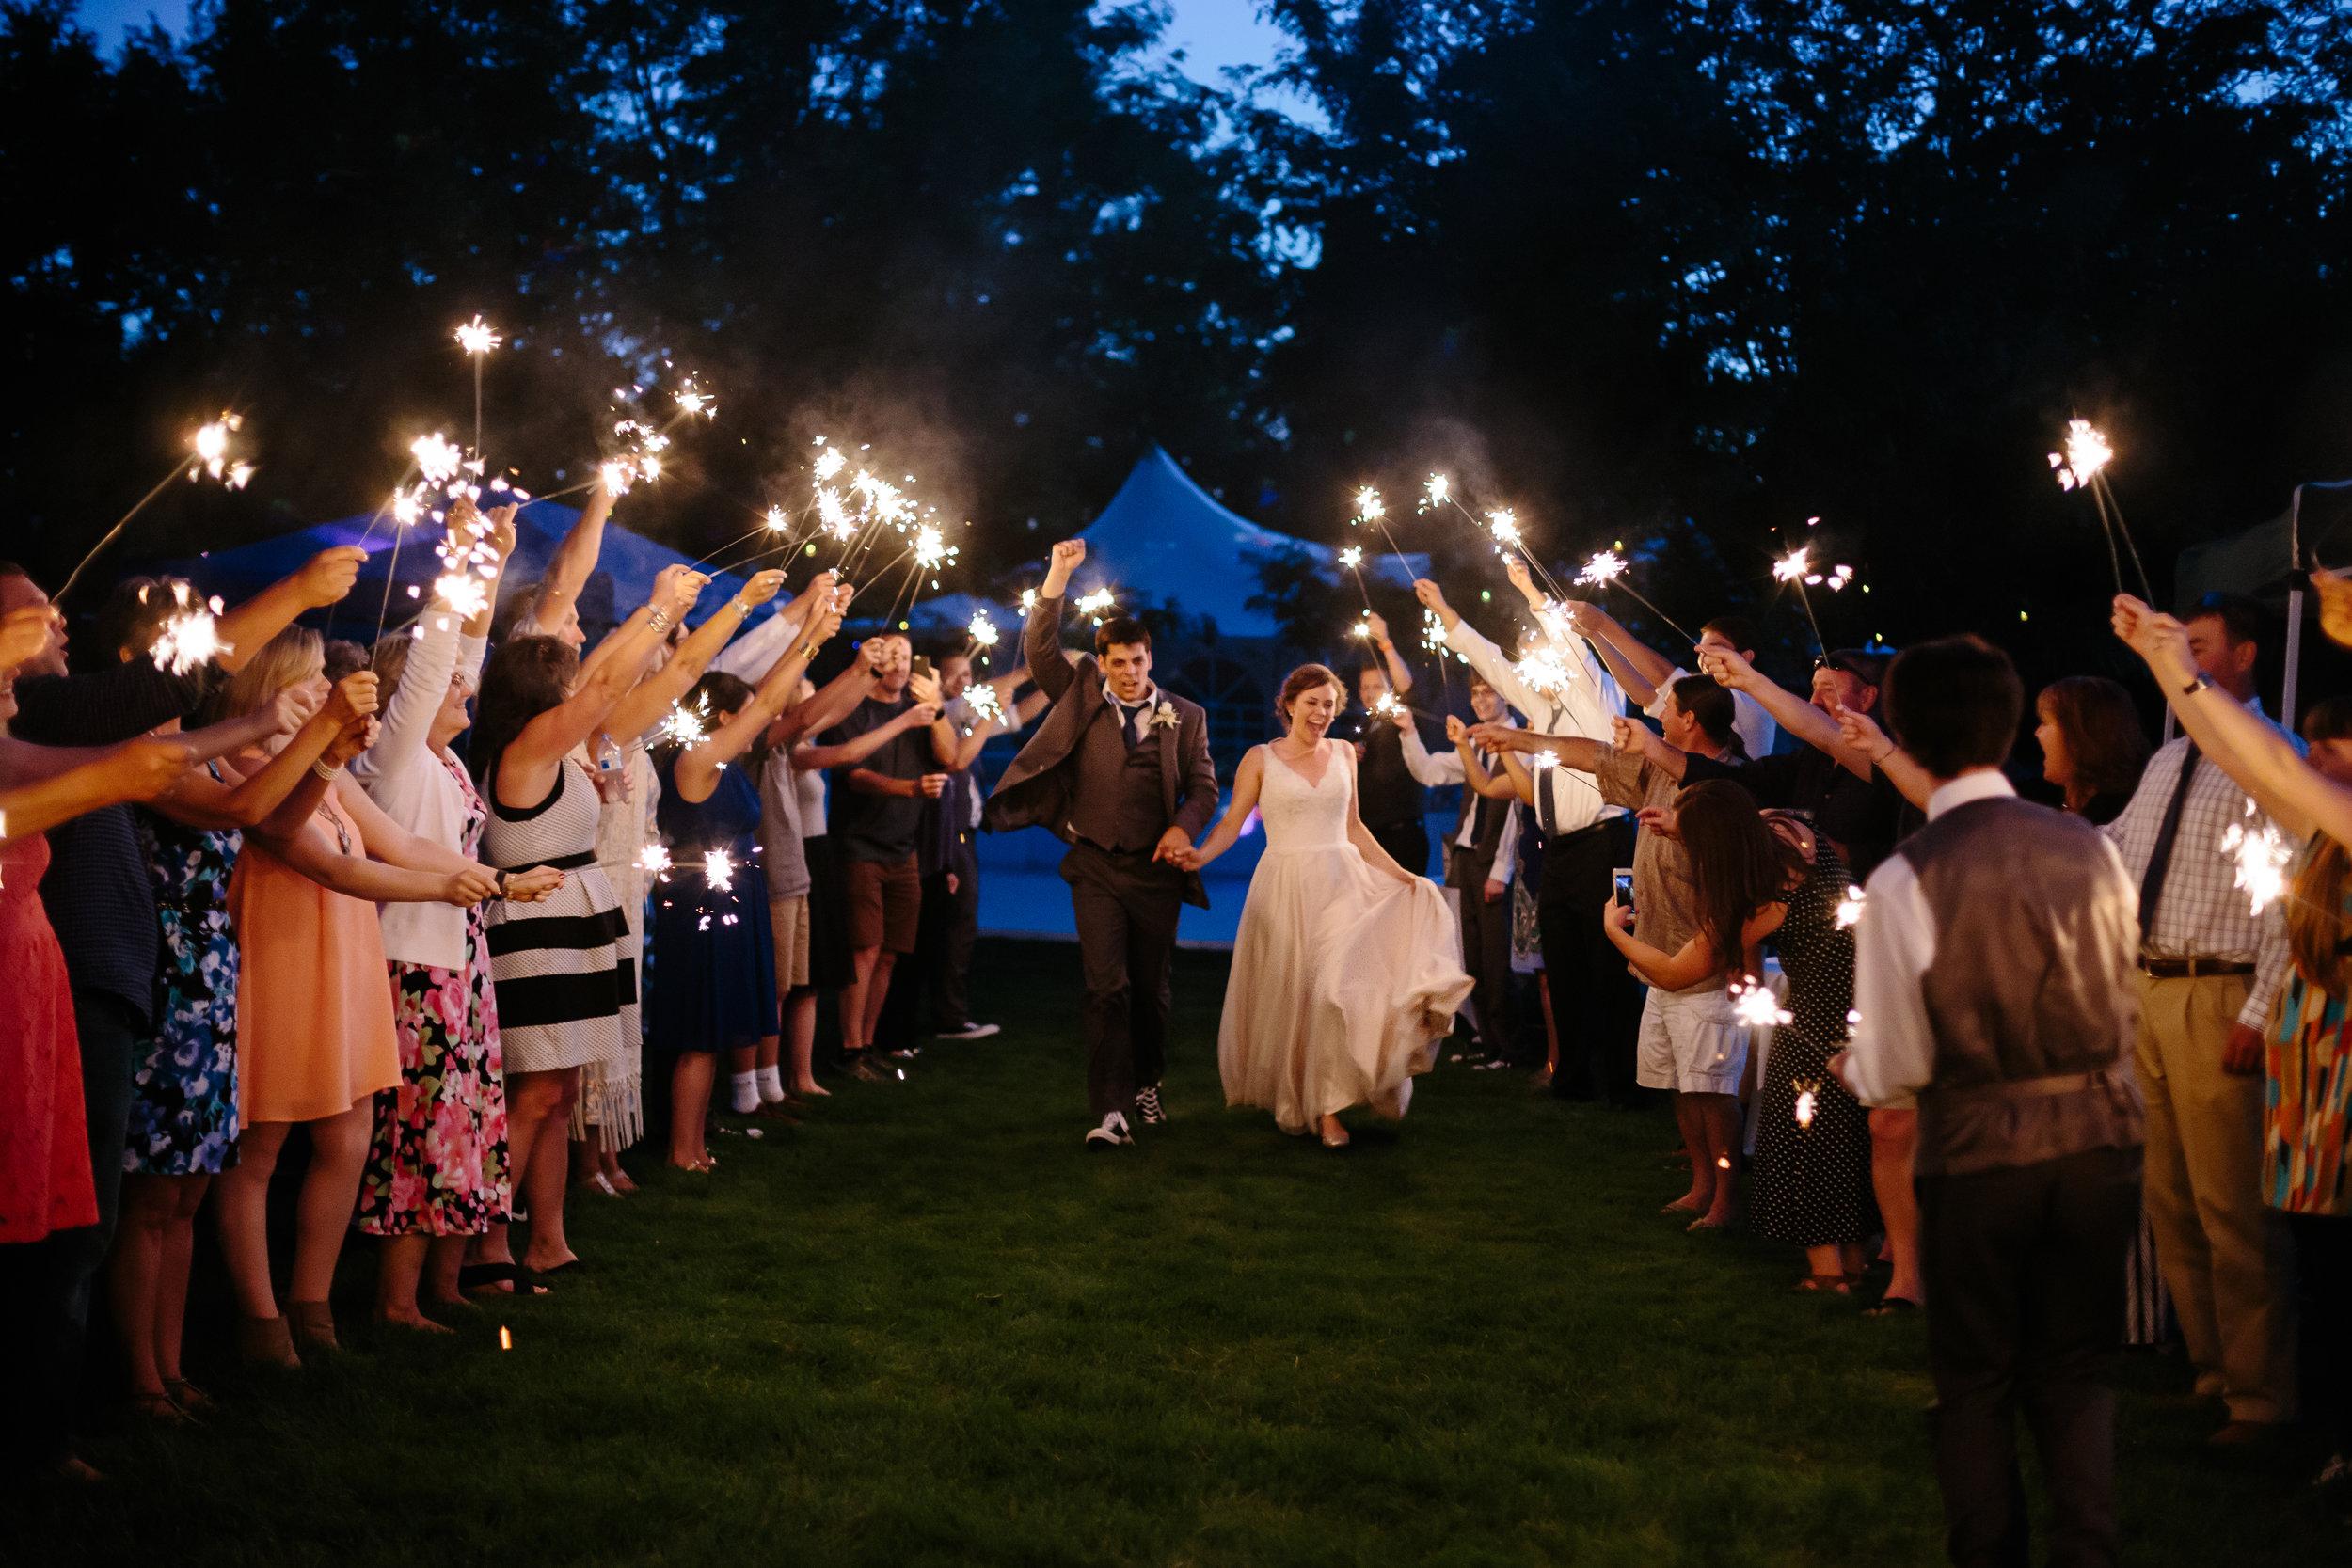 Jordan & Shantel Married - Idaho - Corrie Mick Photography-384.jpg